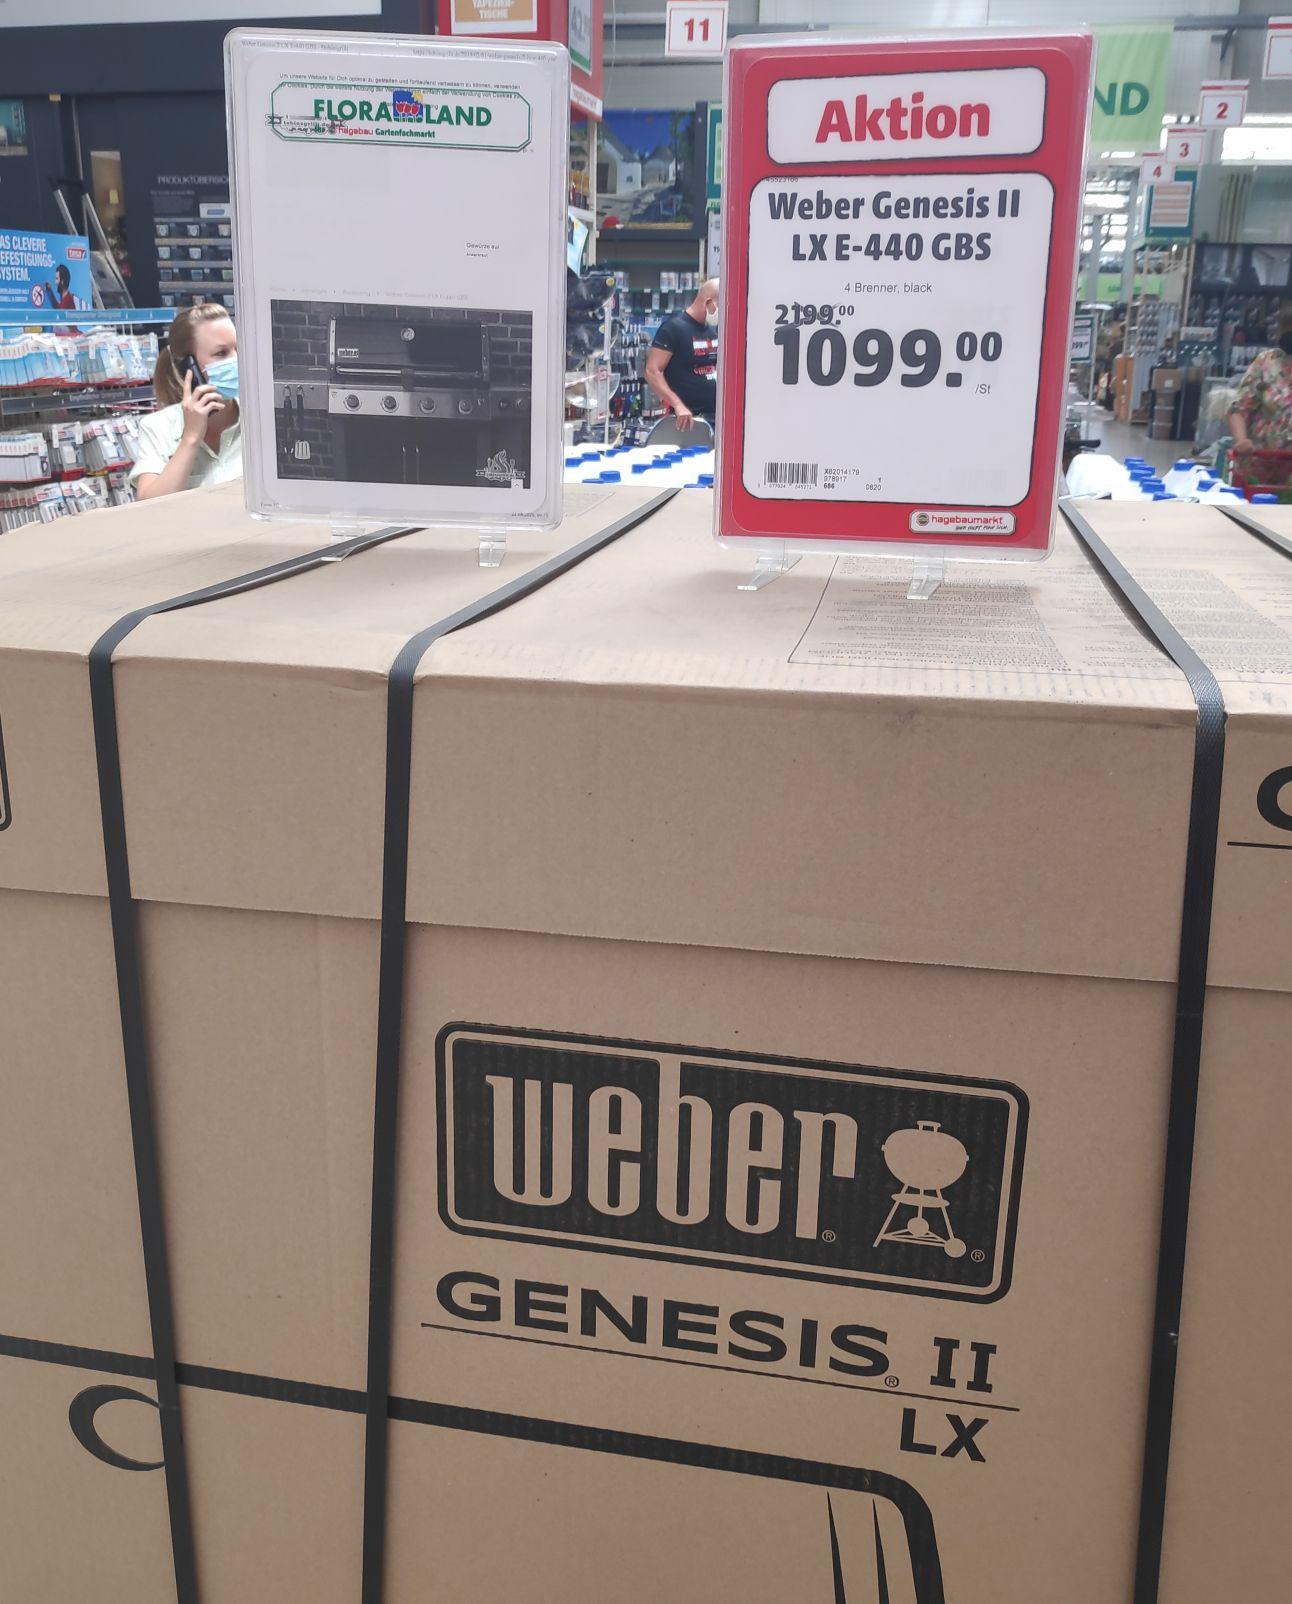 Weber Genesis LX-E 440 GBS im Hagebau in 85386 Eching